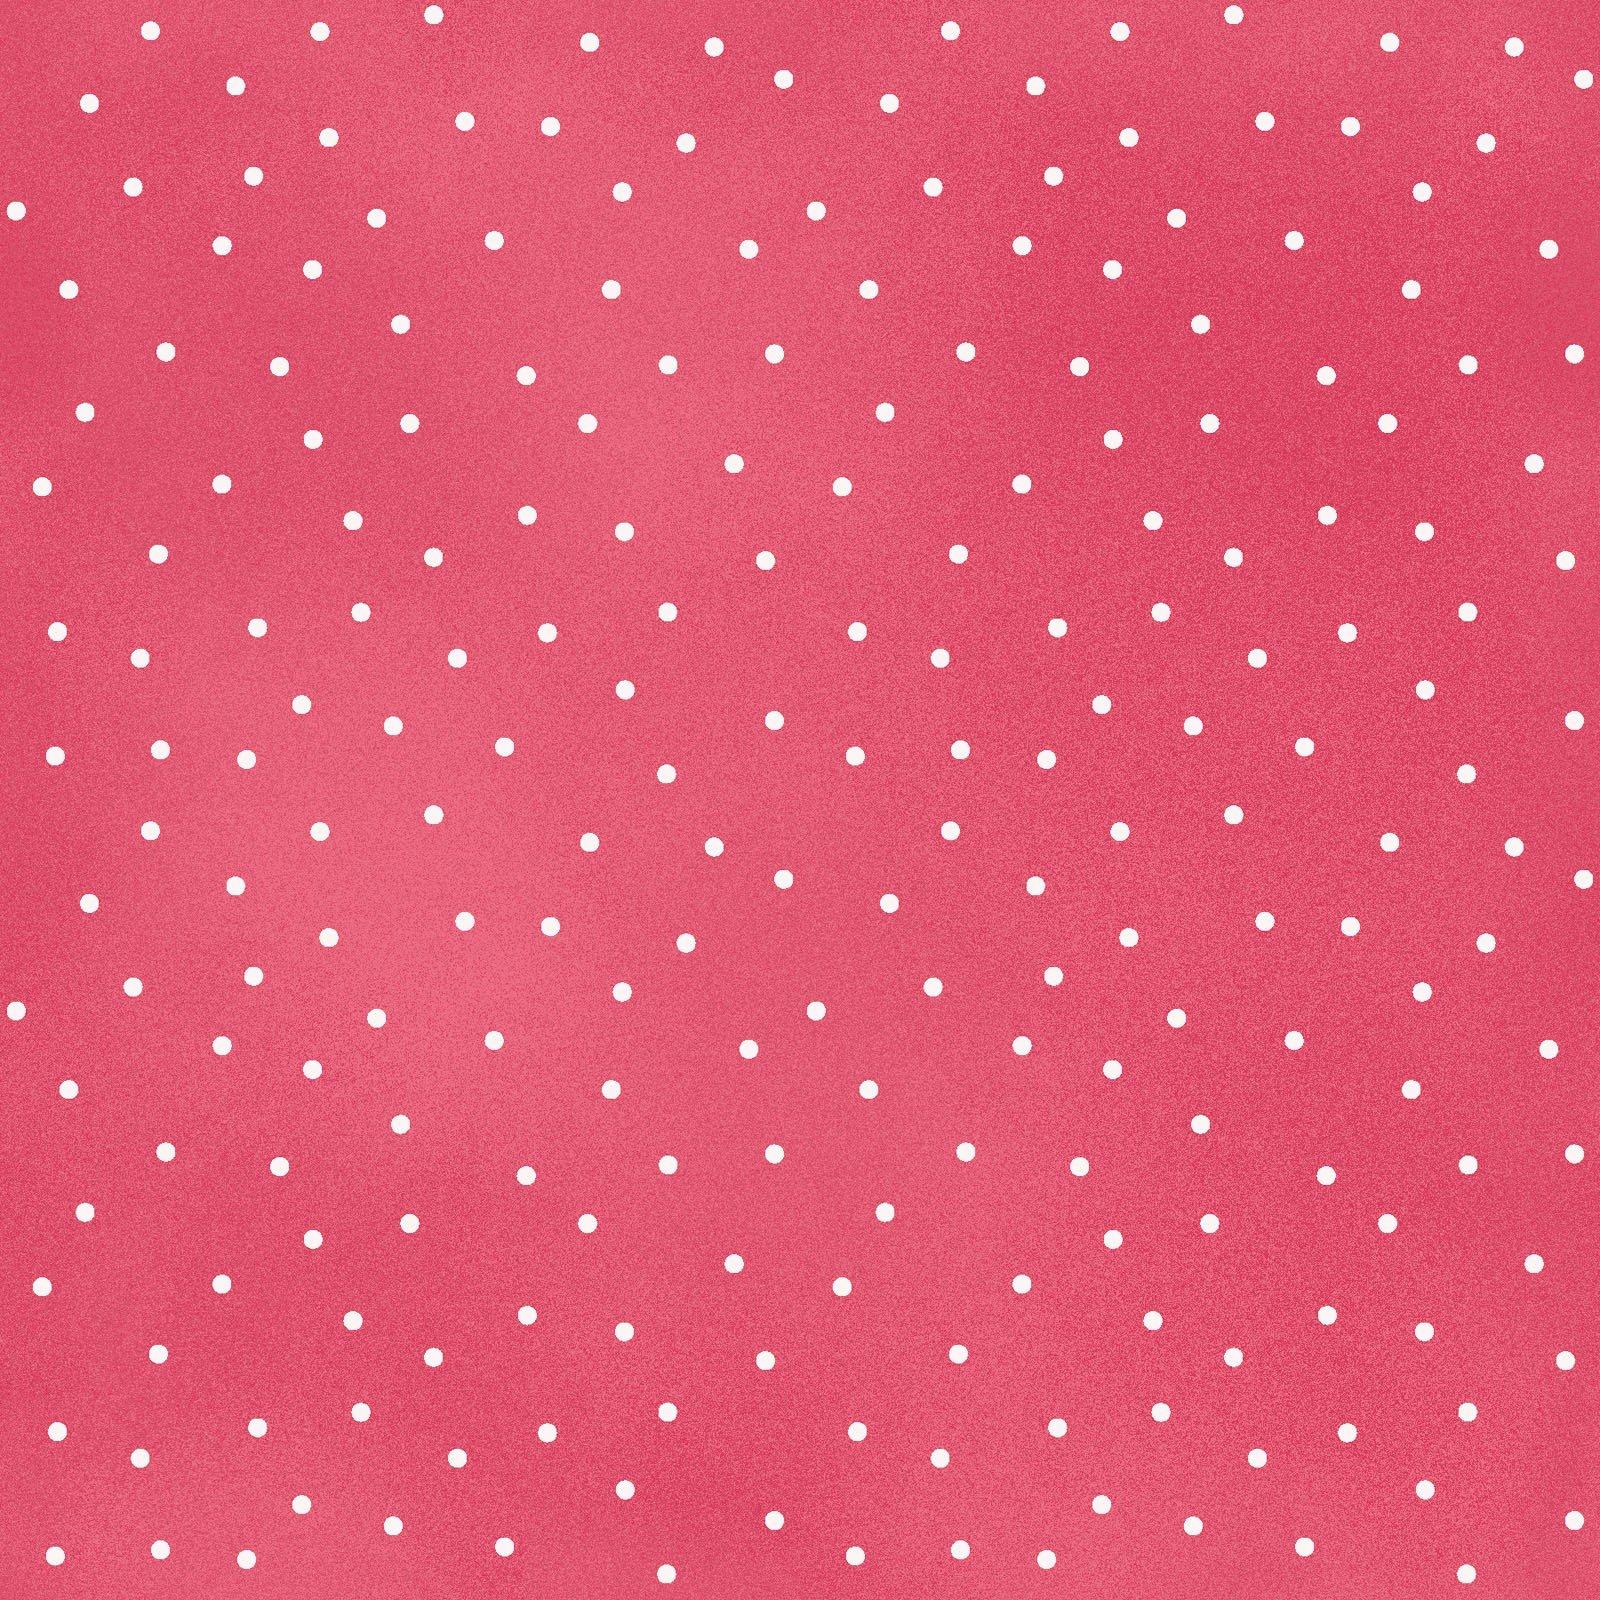 Beautiful Basics 8119-P2 Scattered dots white on pink